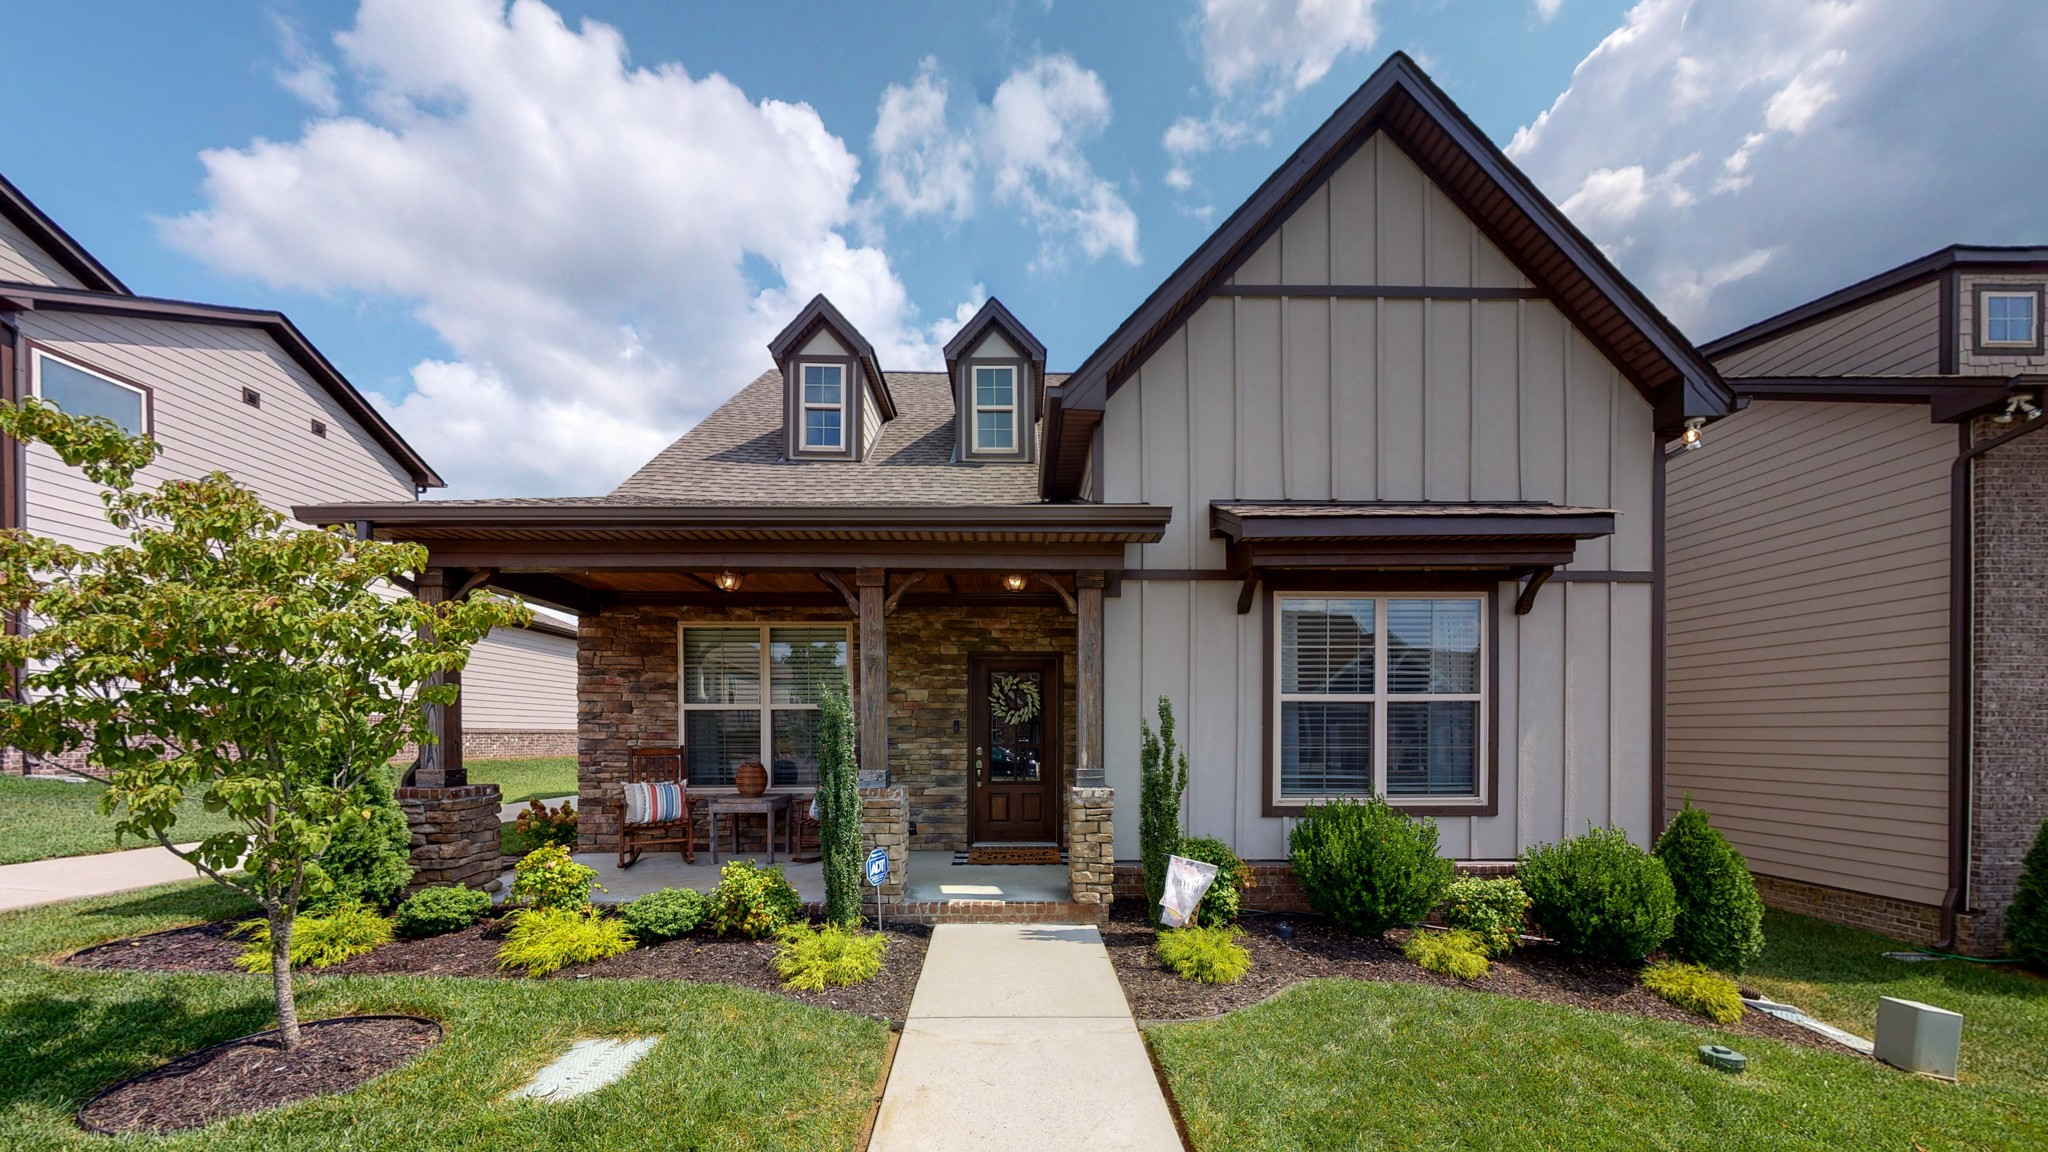 4079 Liberton Way Property Photo - Nolensville, TN real estate listing